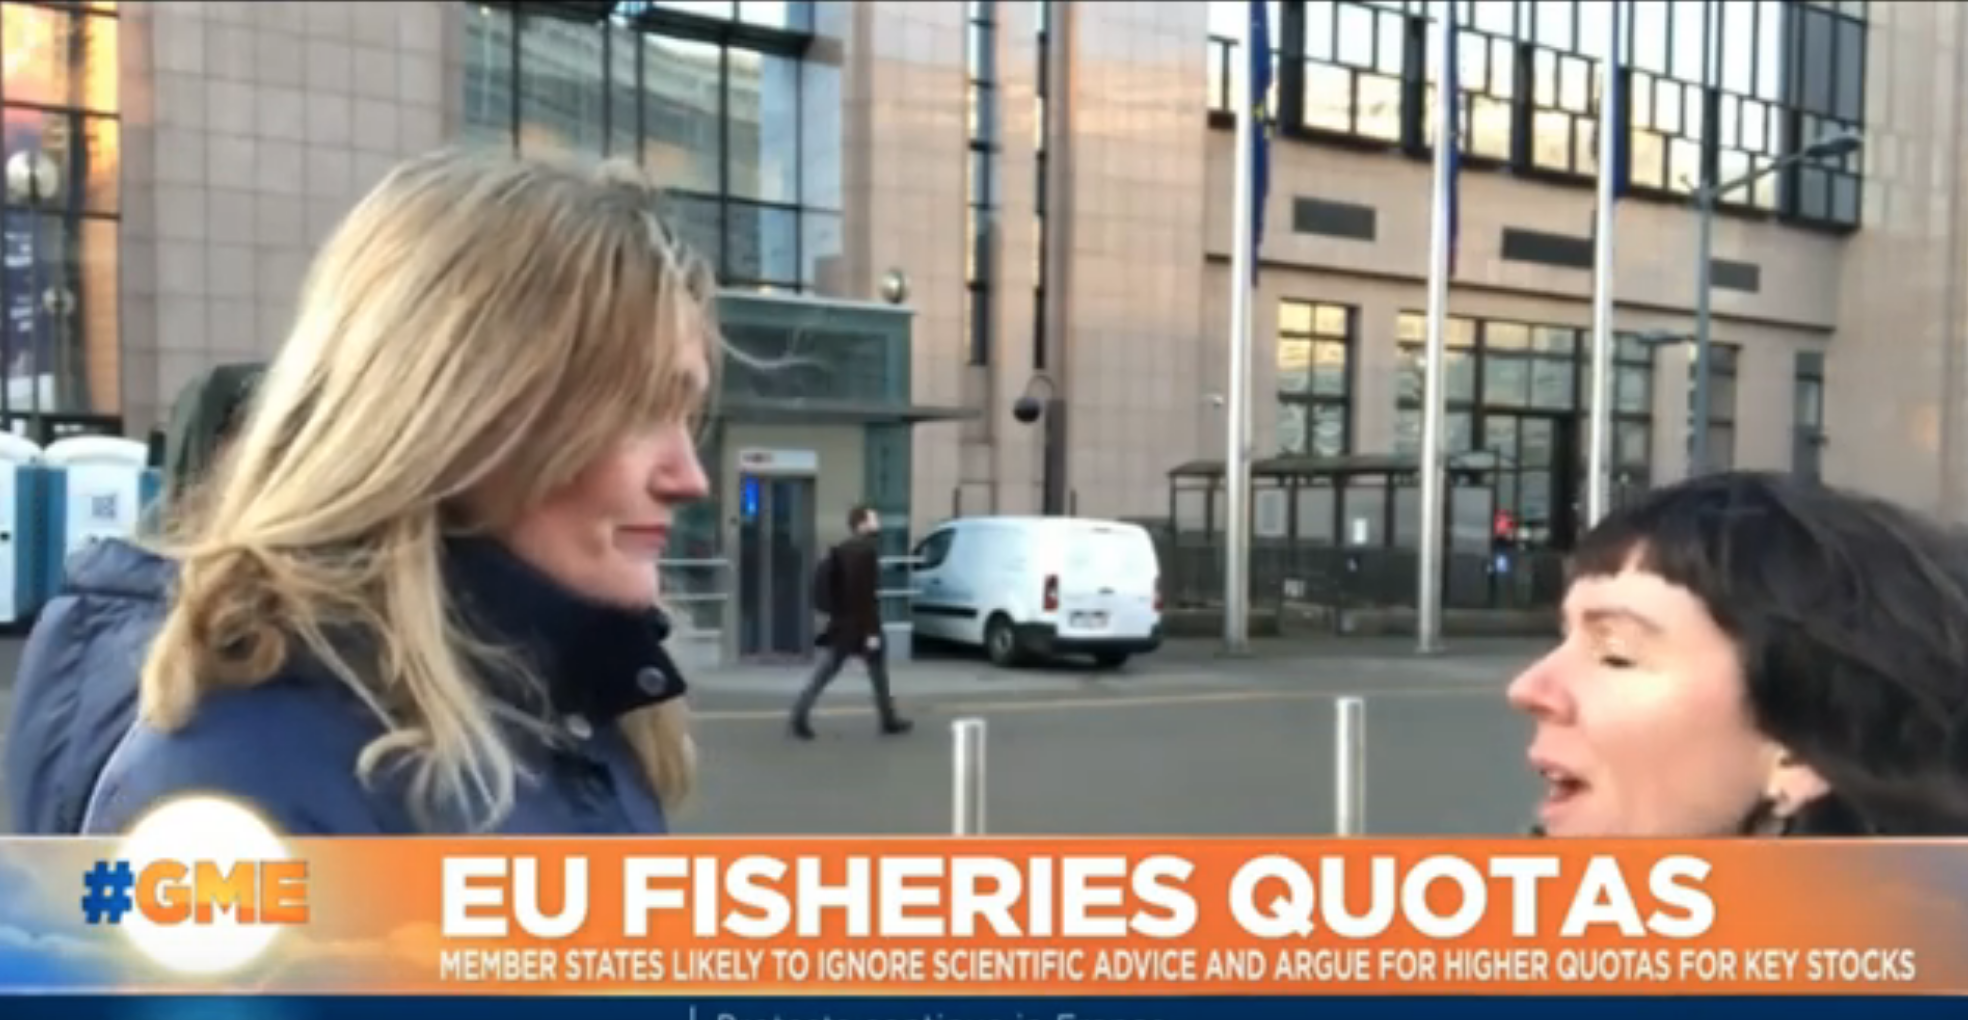 Rebecca Hubbard on Euronews